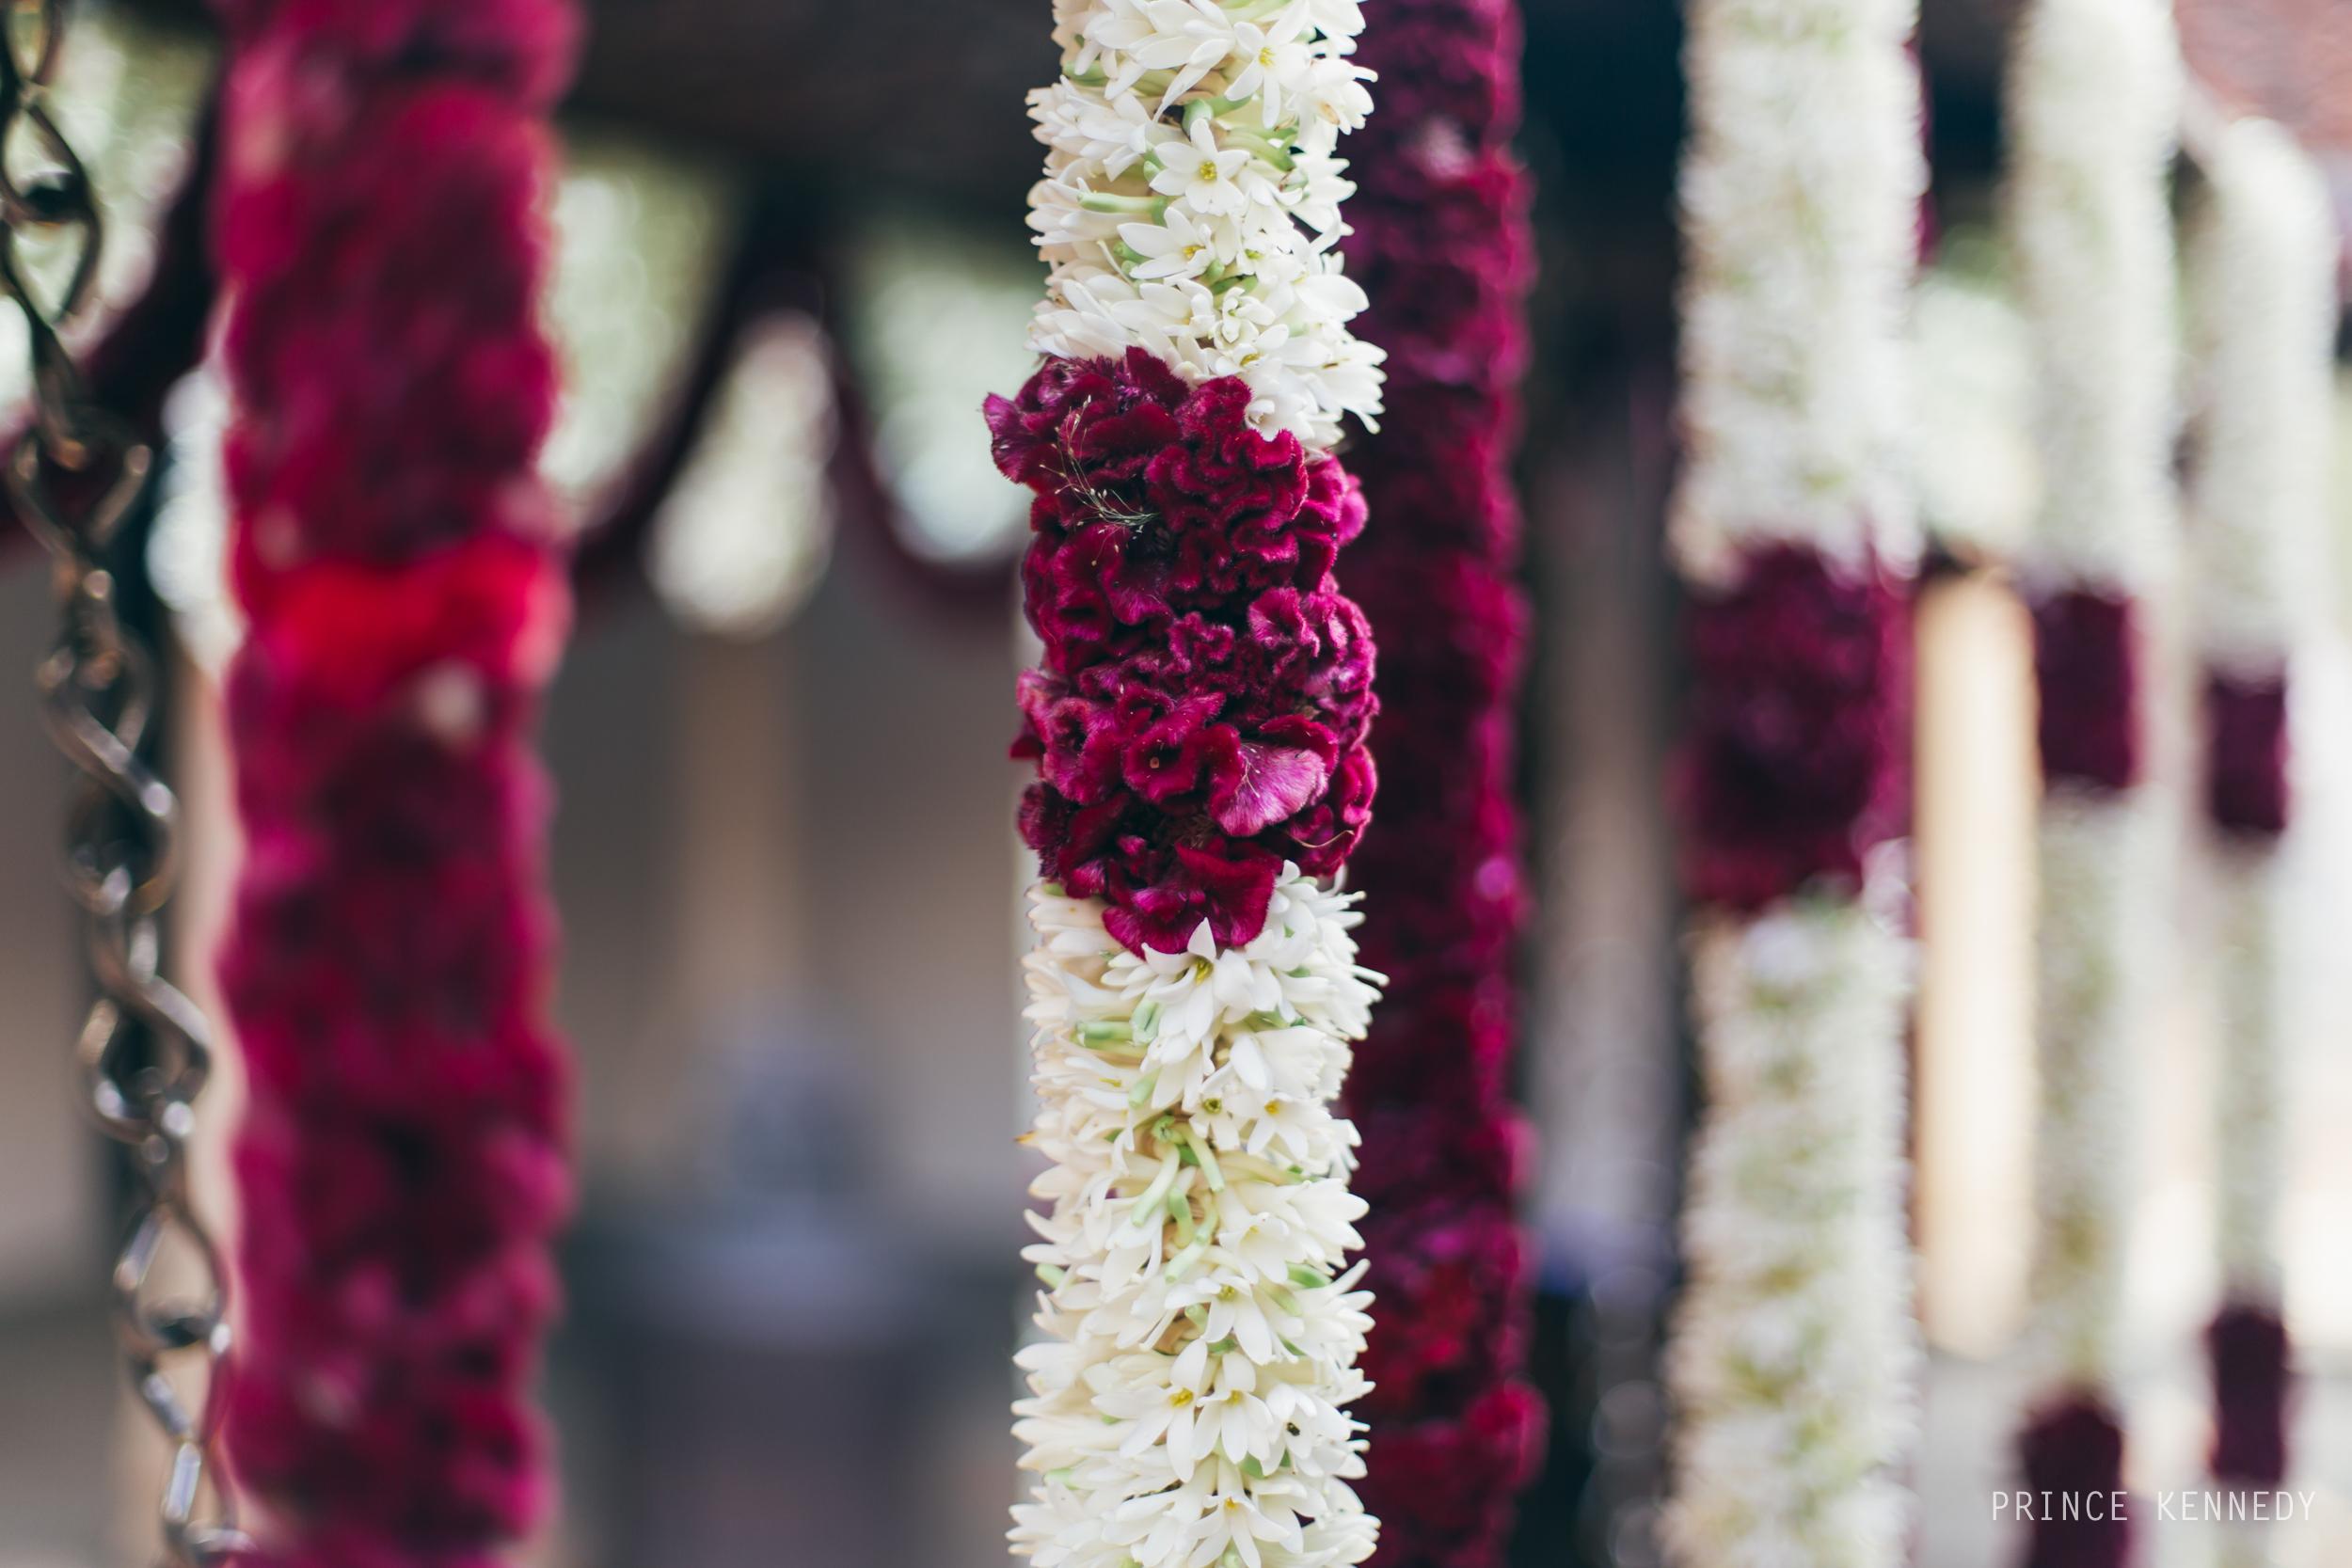 Athmajja-Nithesh-Engagement-Couple-Portrait-Portraiture-Wedding-Couple-Portrait-Chennai-Photographer-Candid-Photography-Destination-Best-Prince-Kennedy-Photography-20.jpg